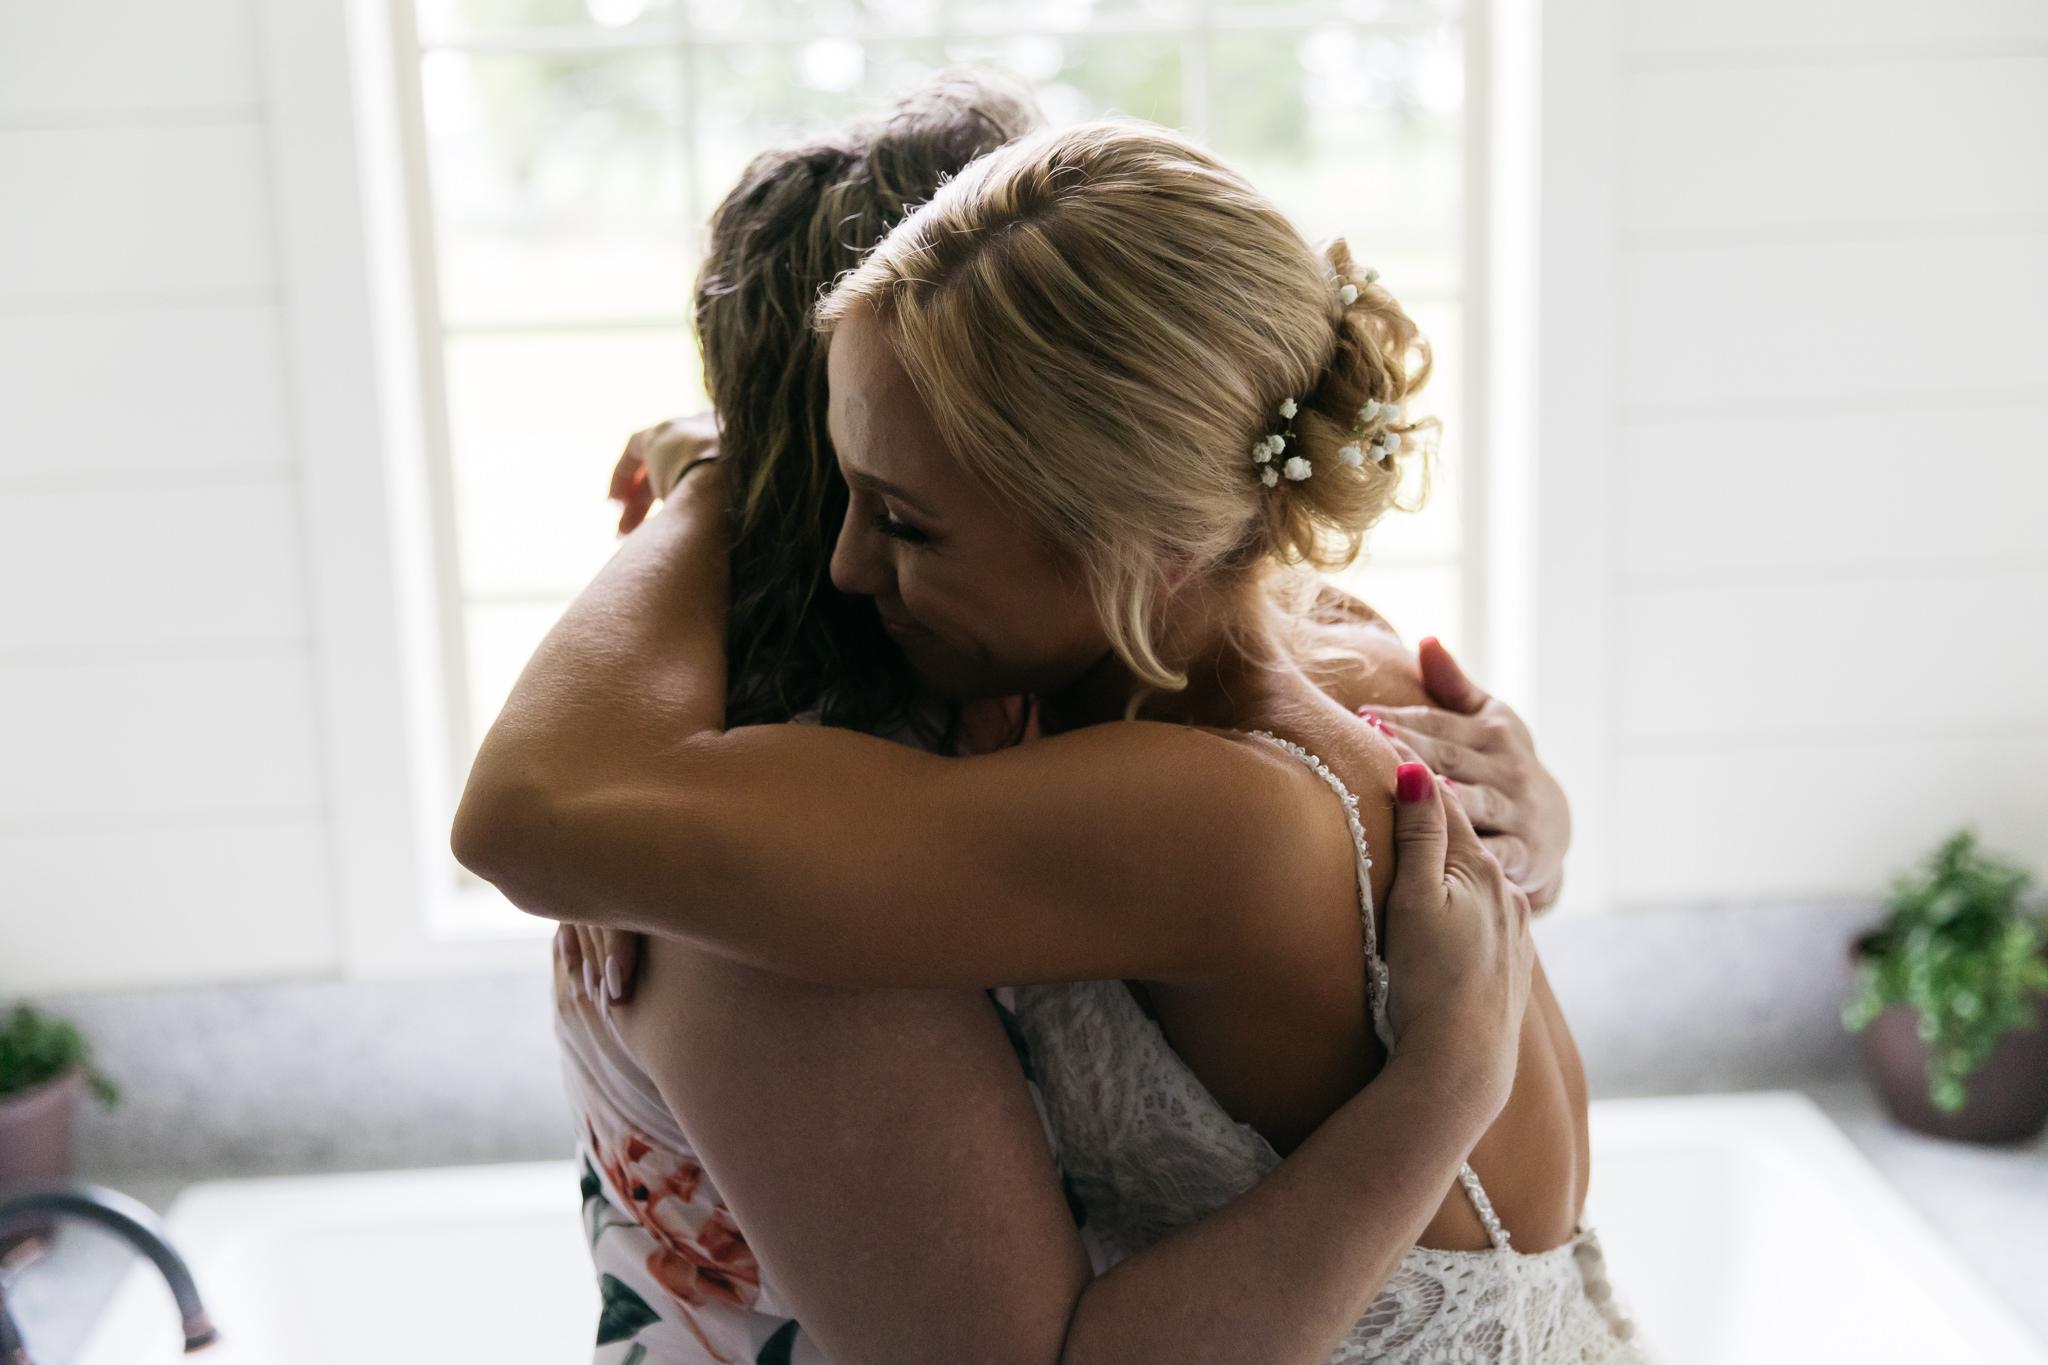 backyard-wedding-thewarmtharoundyou-lexy-branson-12.jpg